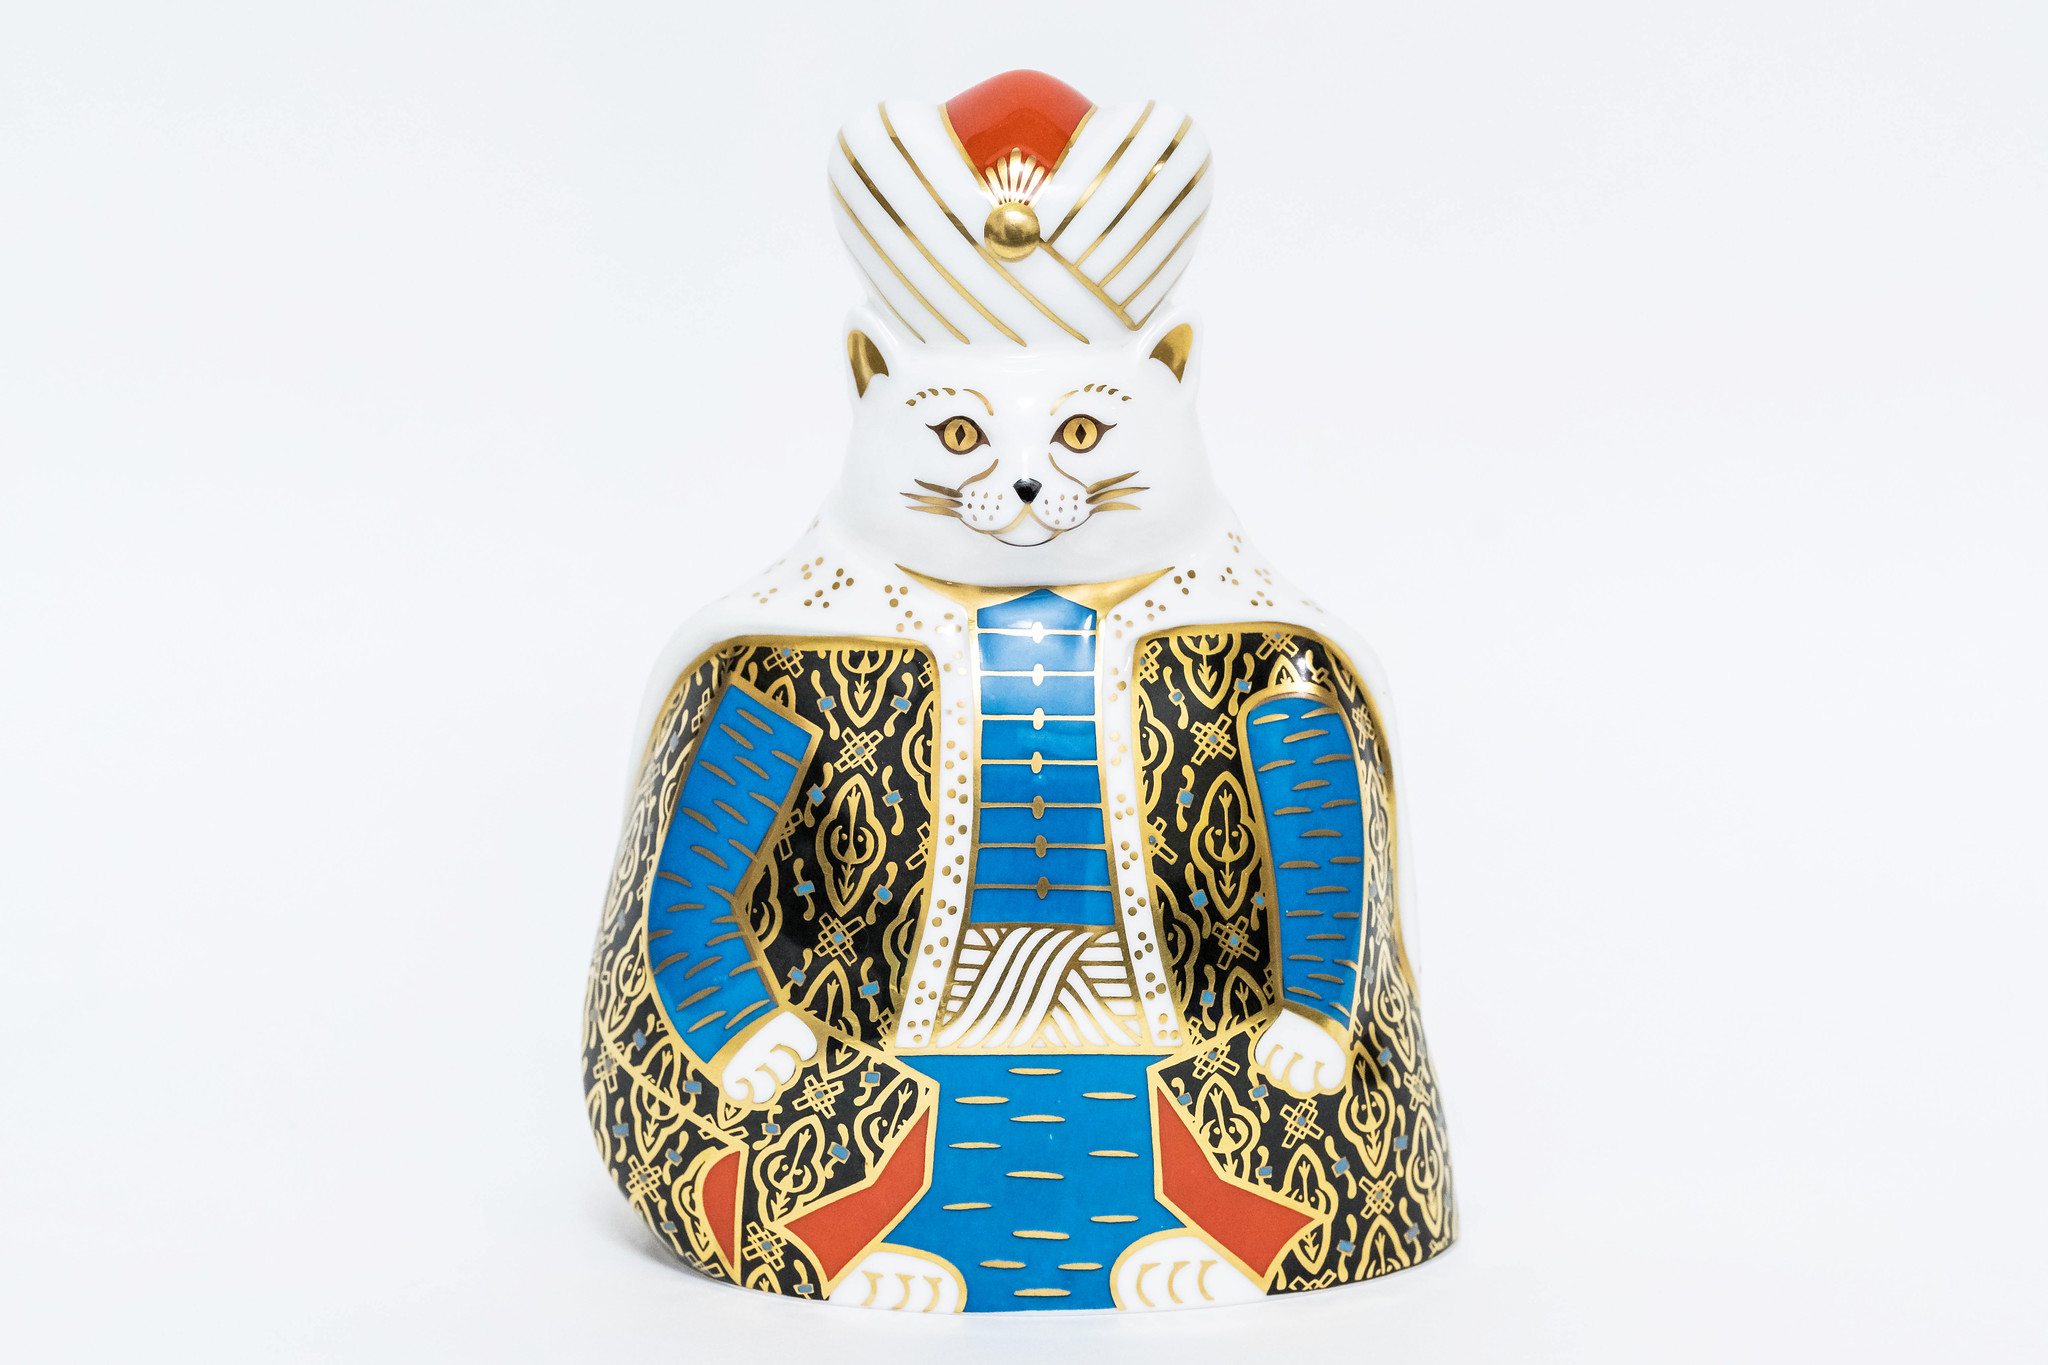 Royal Cat / Royal Crown Derby